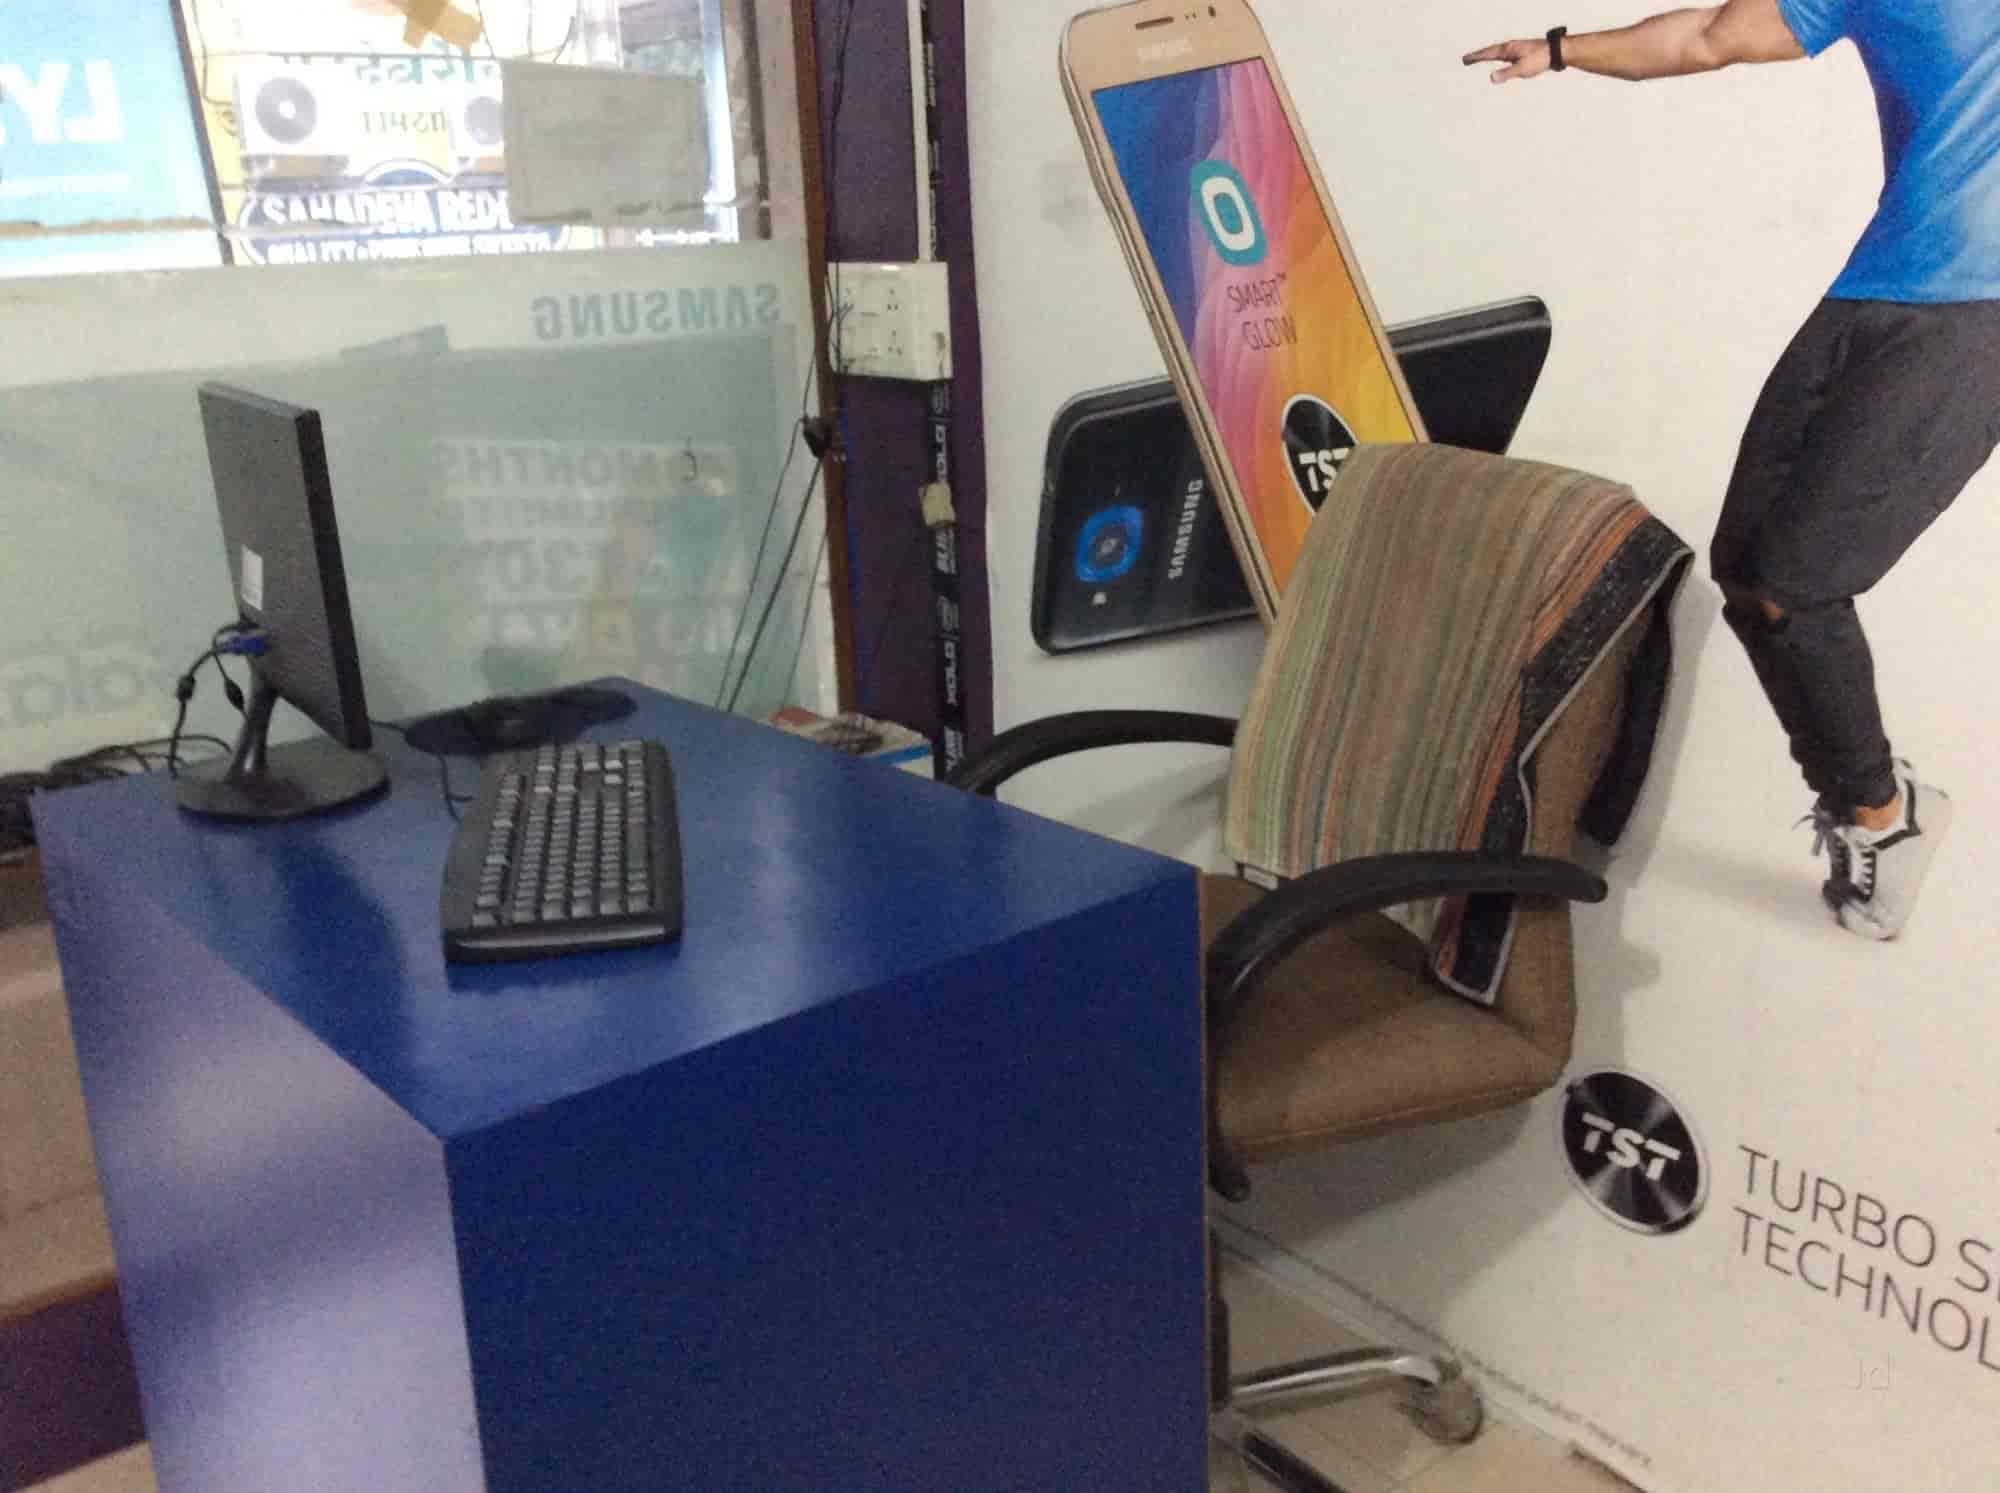 km communication mobile stores dilsukhnagar mobile phone rh justdial com